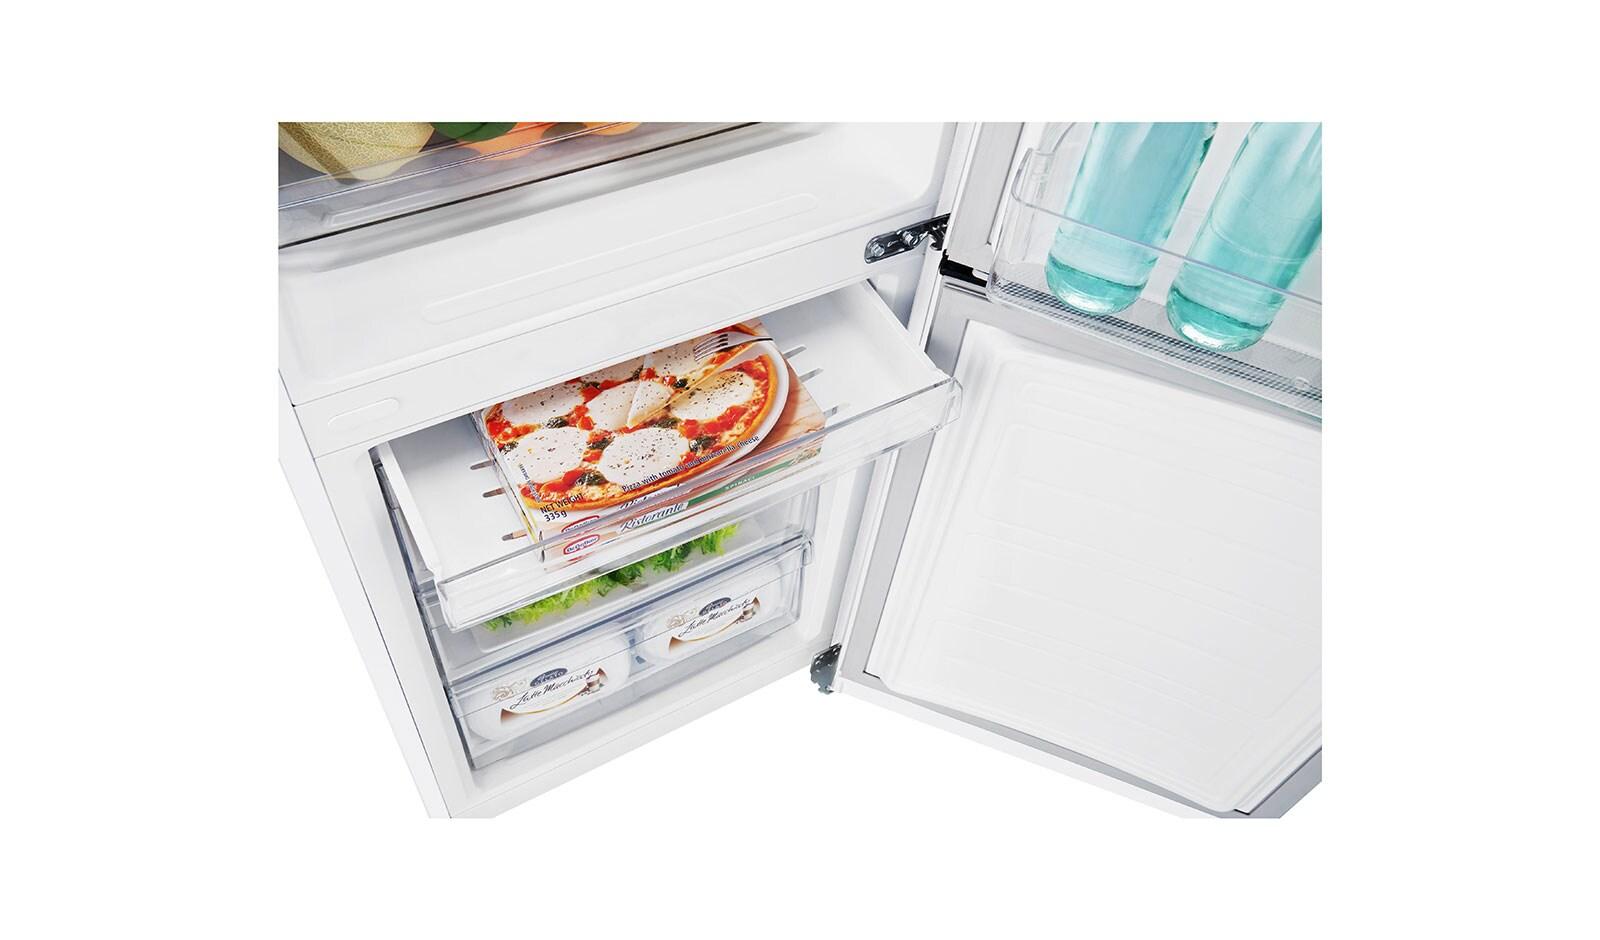 hight resolution of lg 24 counter depth bottom freezer refrigerator with smart inverter 12 cu ft lg canada